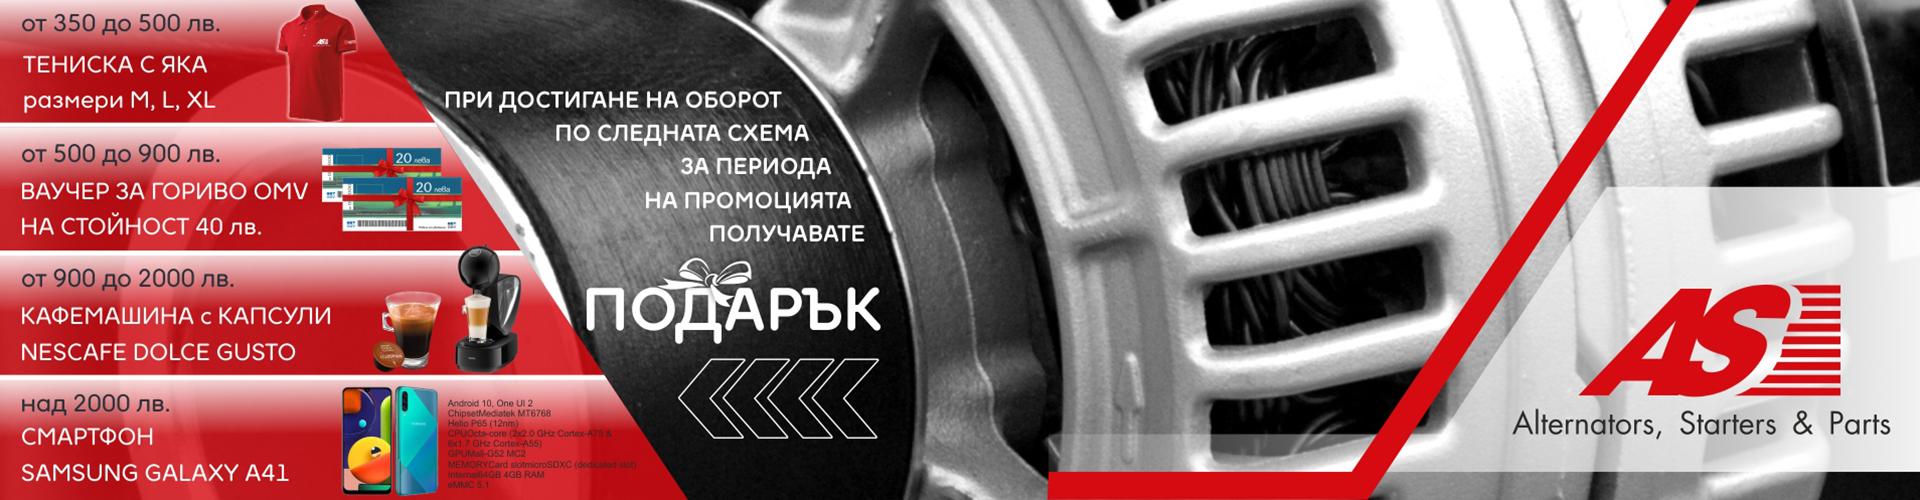 promo_aspl_01.06.2020-31.07.2020_banner.jpg